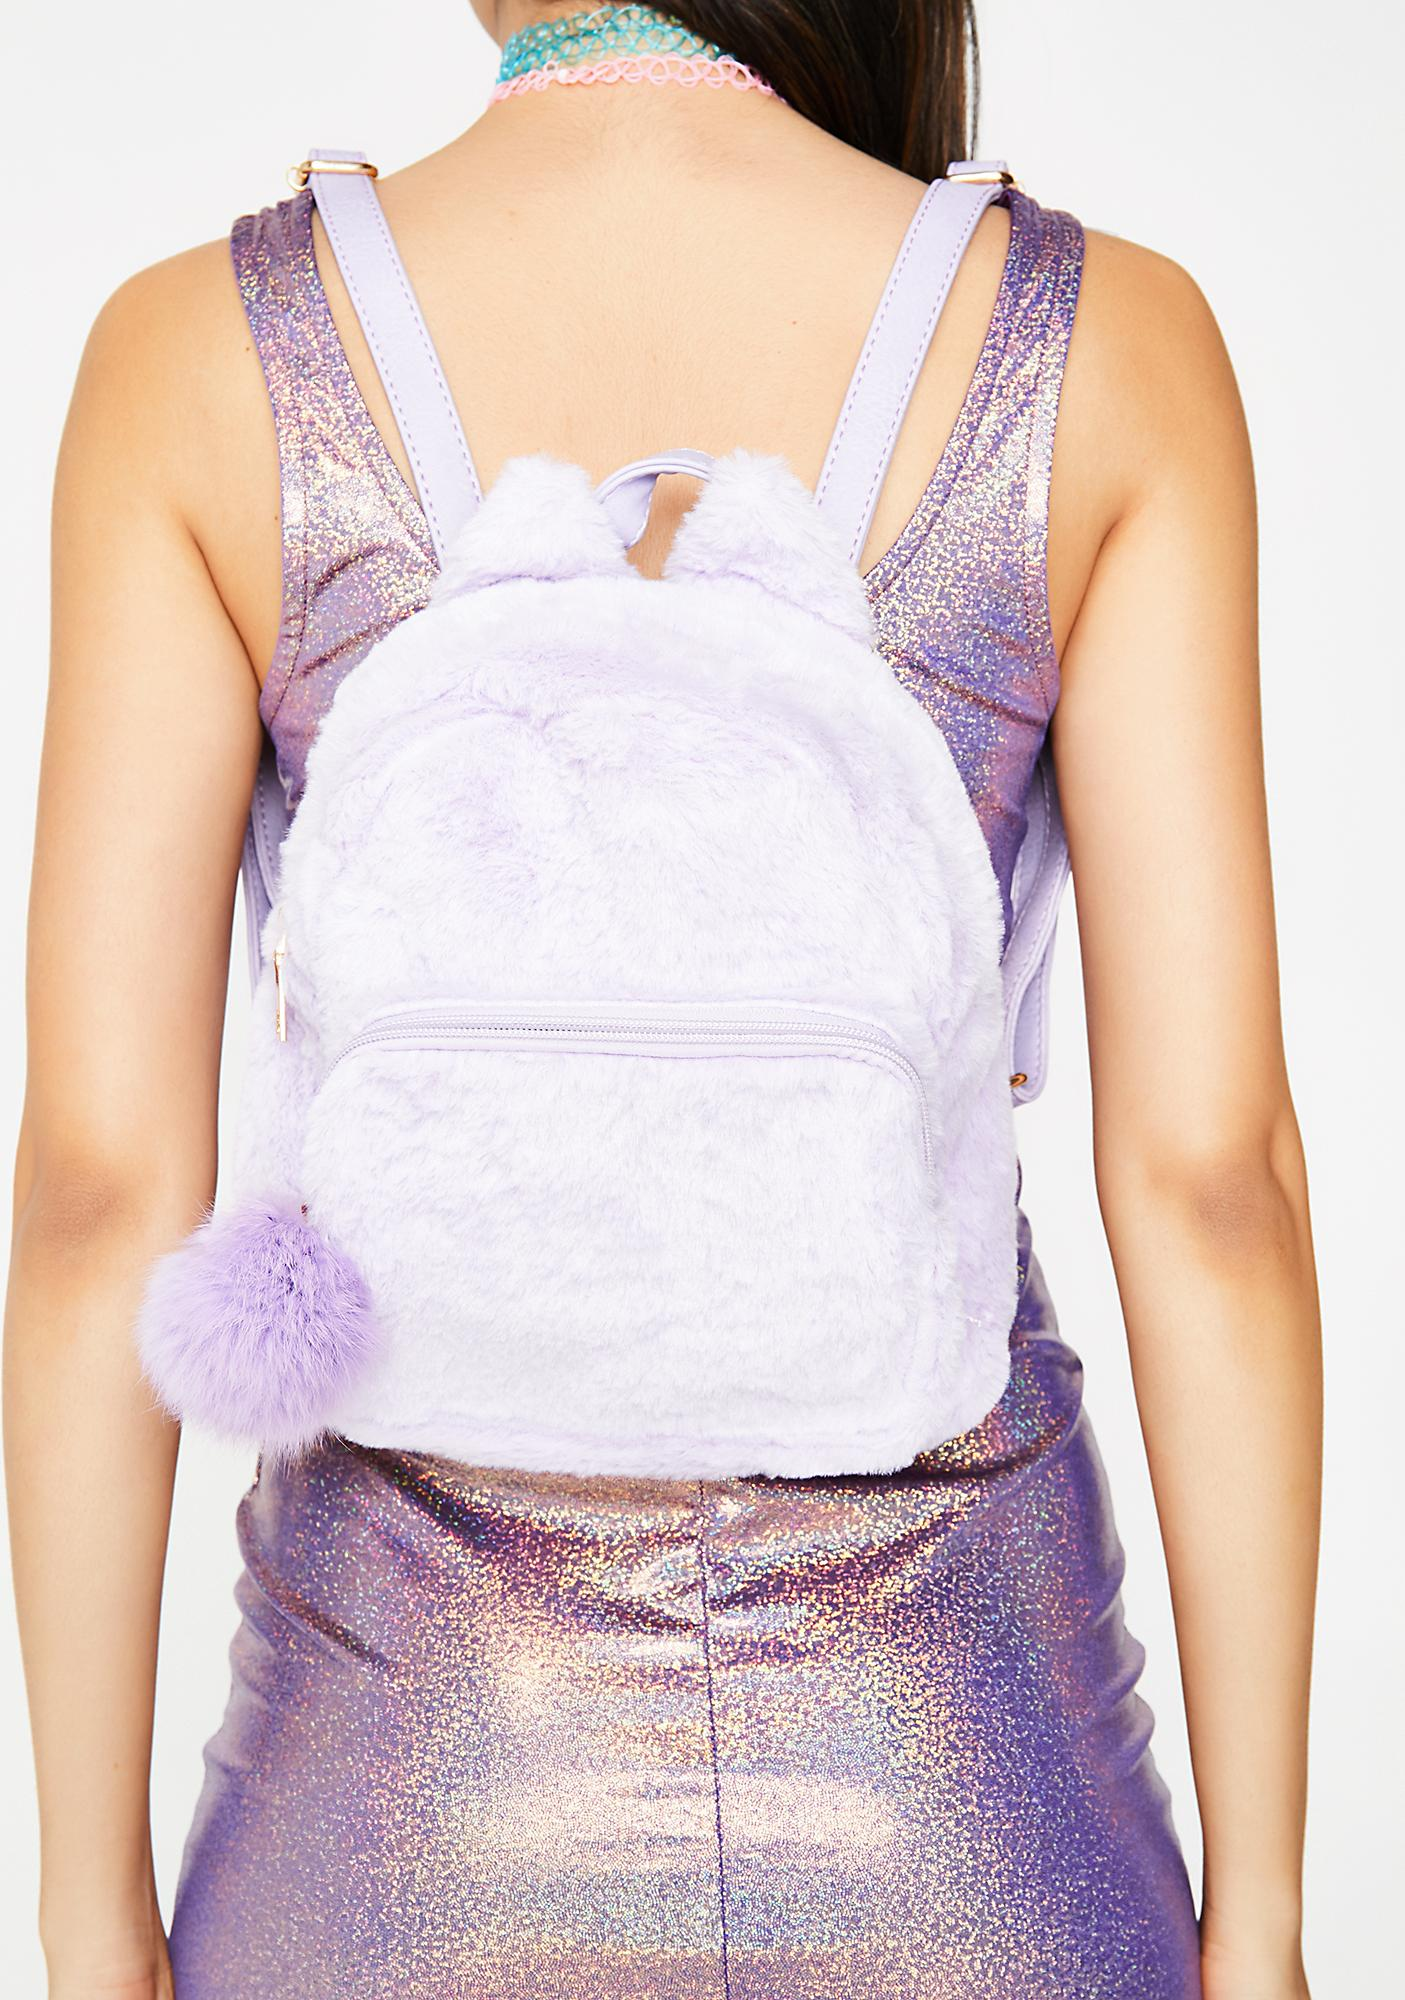 Lavender Stroke Of Genius Mini Backpack